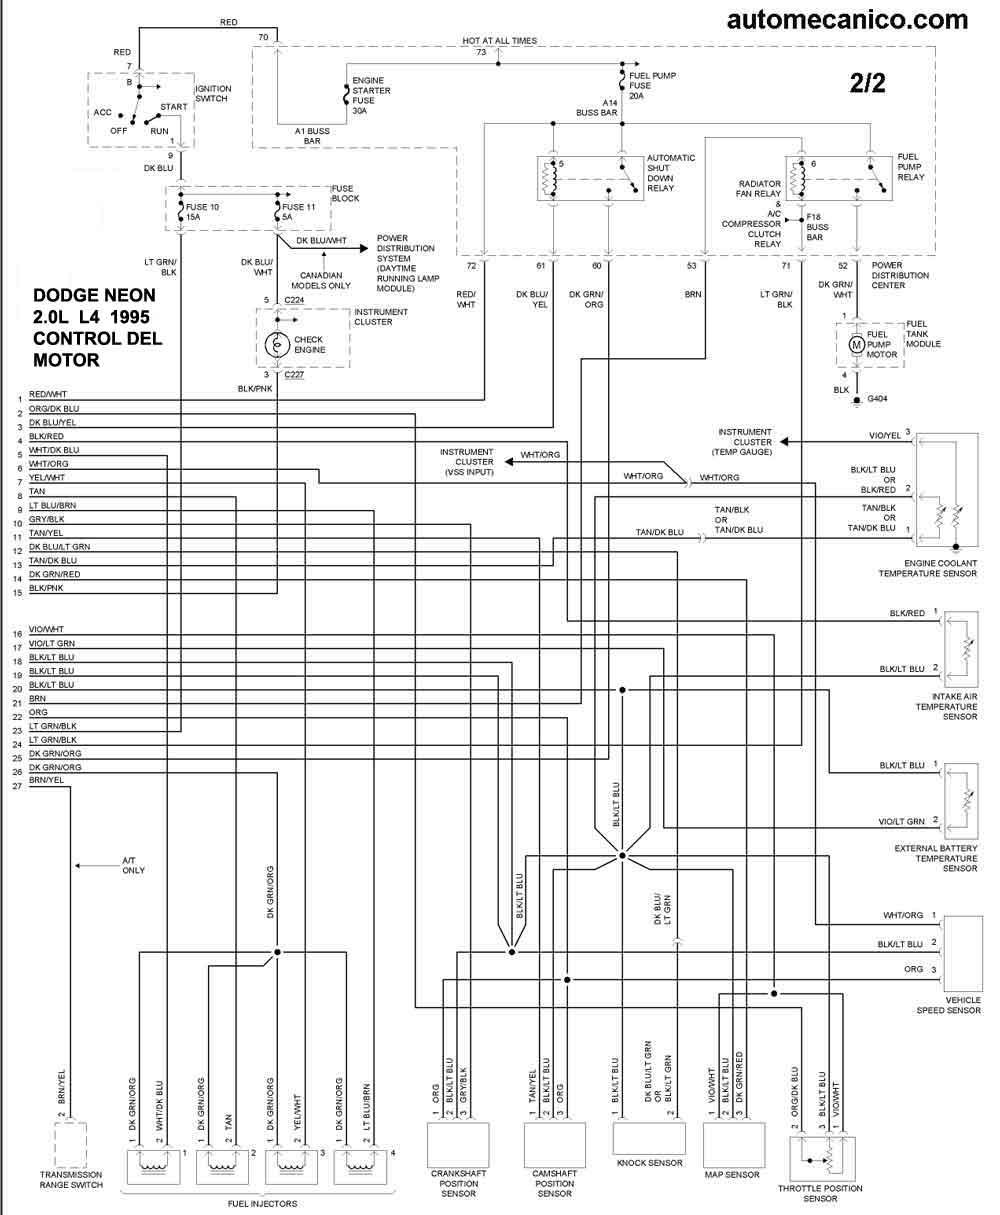 medium resolution of dodge neon wiring diagram dodge neon steering diagram hobart hcm 450 wiring diagram generation 4 wiring